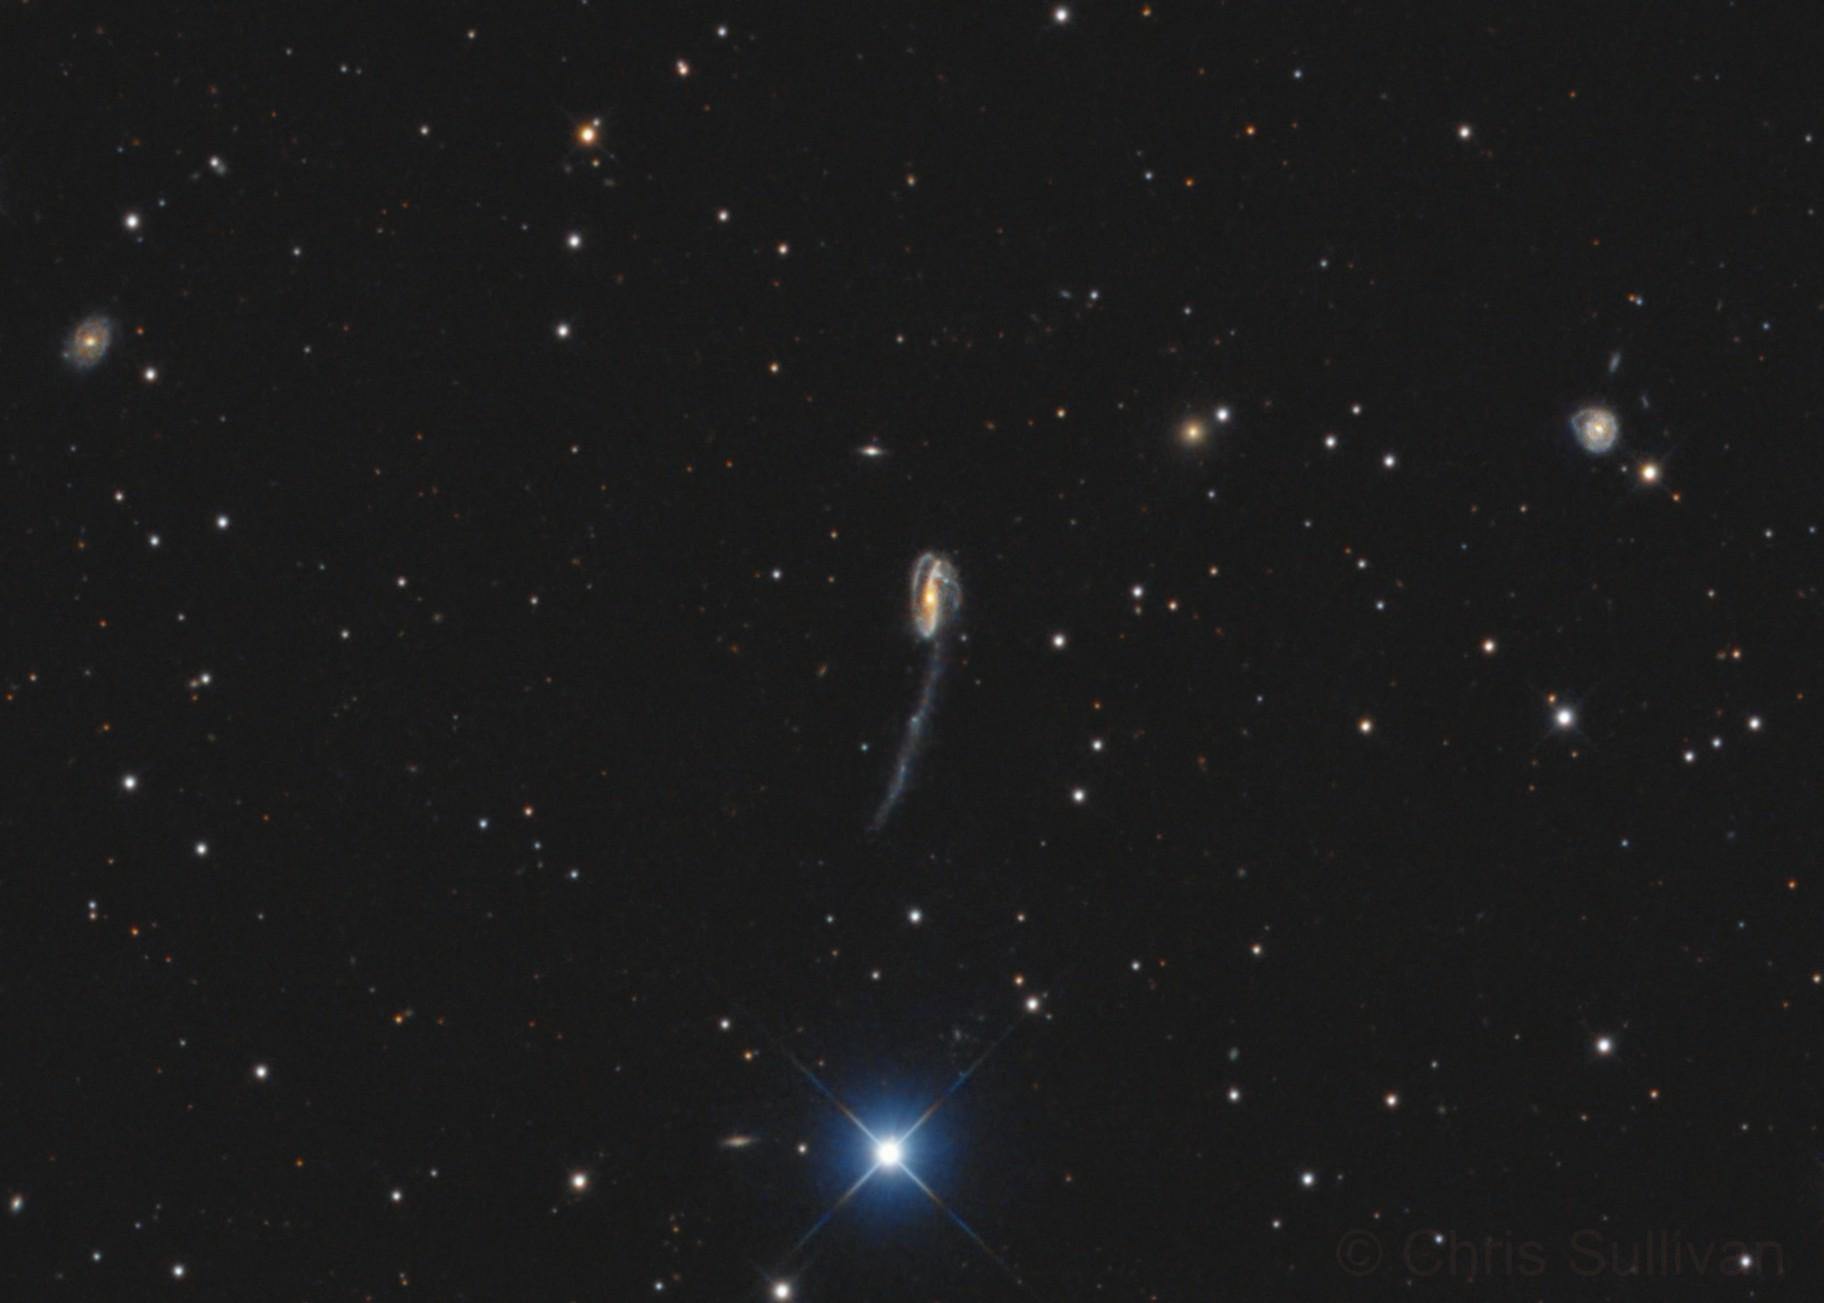 Tadpole Galaxy (Arp 188 / UGC 10214)